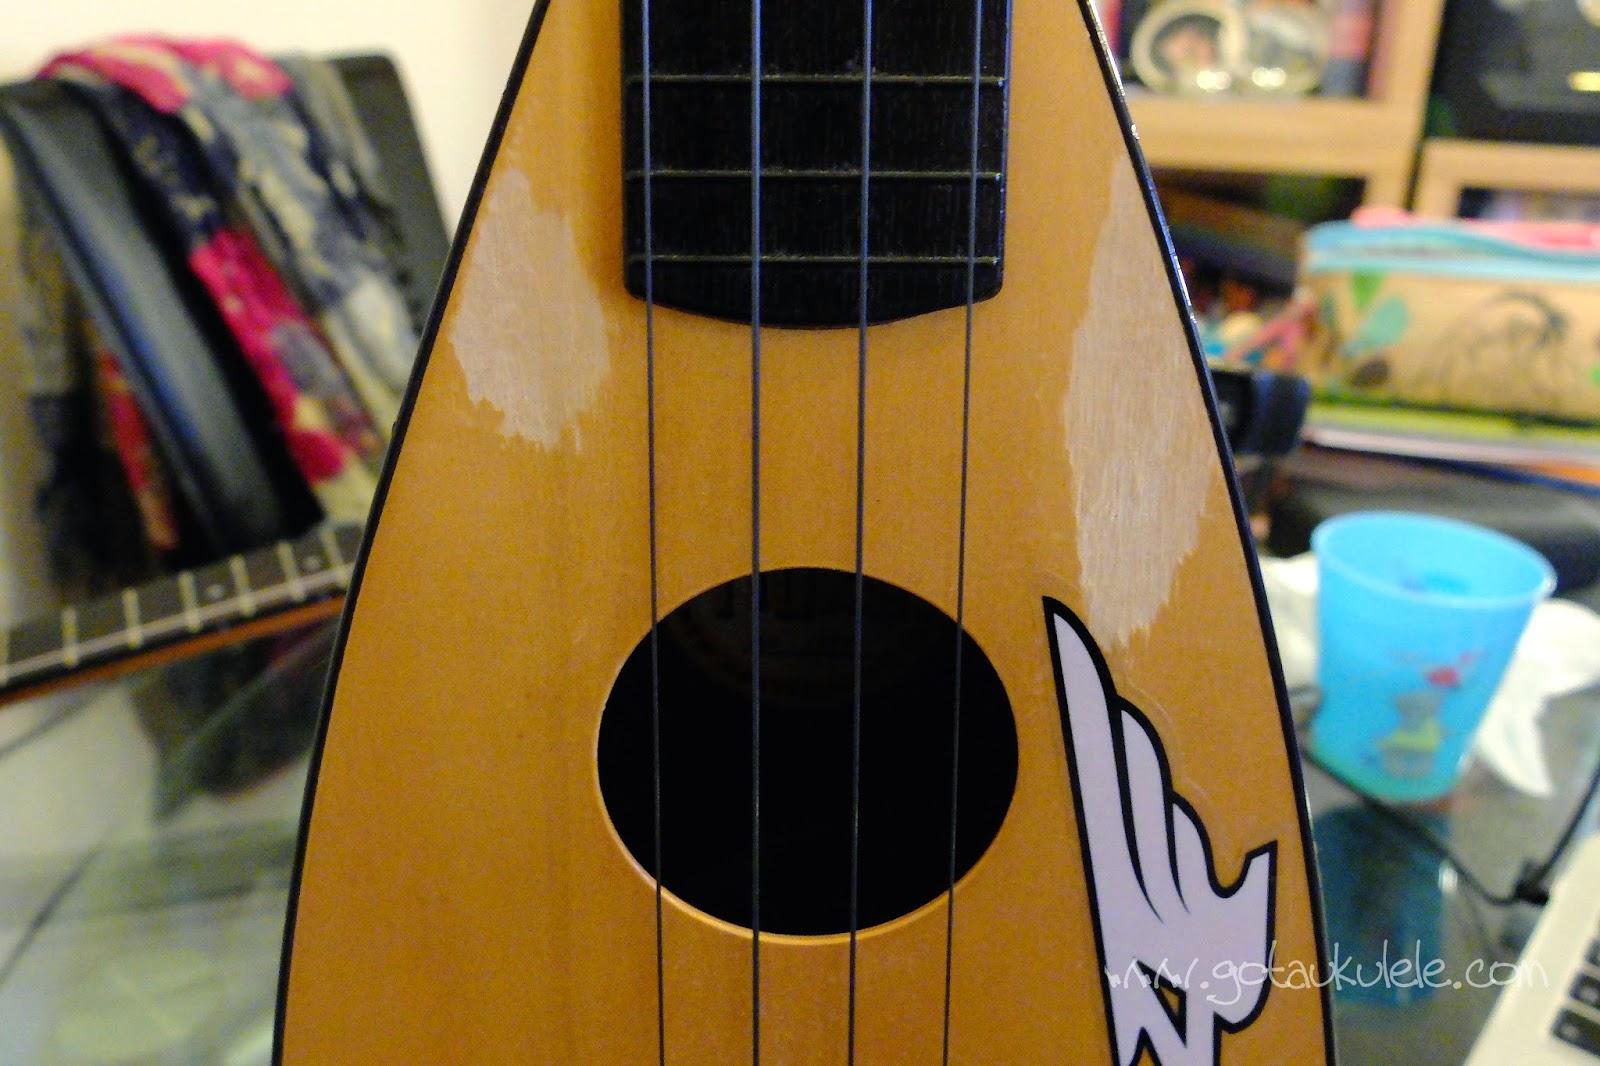 Aquila Lava Ukulele Strings on a Fluke